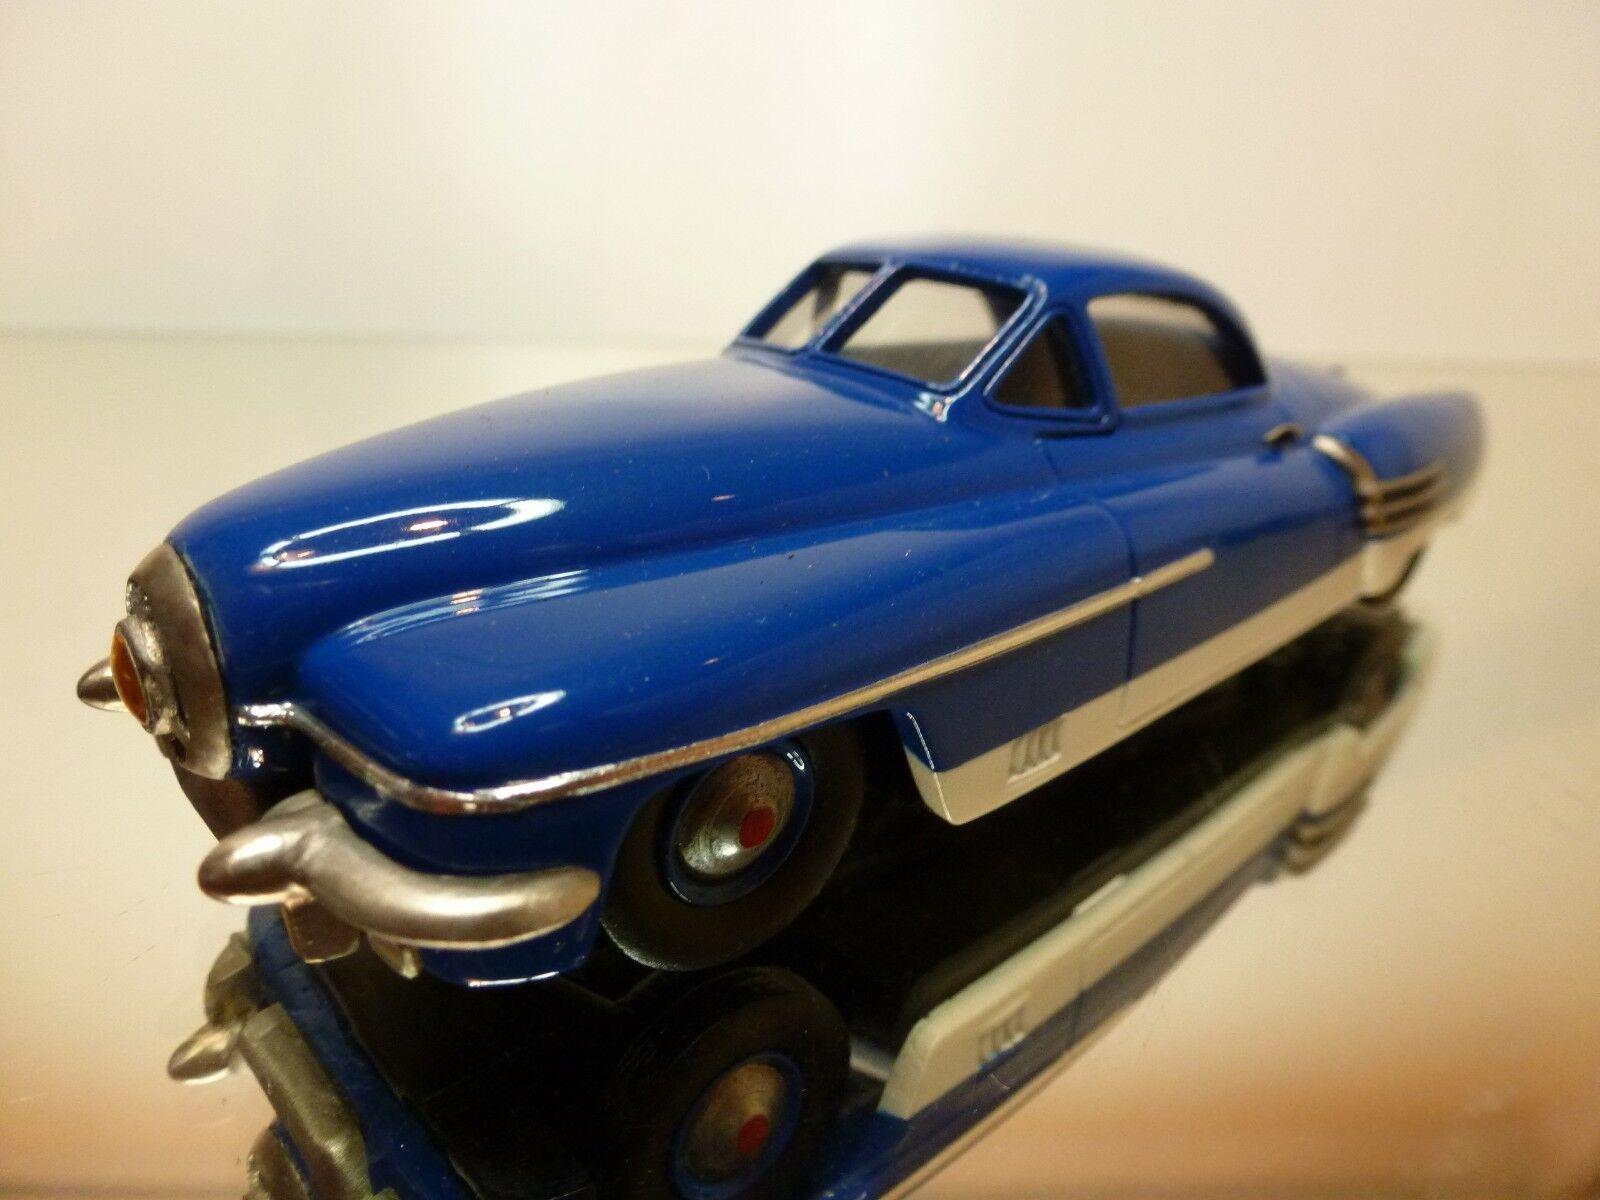 ZILL 112 ZIS 112 SPORT 1951 - azul + blanco 1 43 - EXCELLENT CONDITION - 17